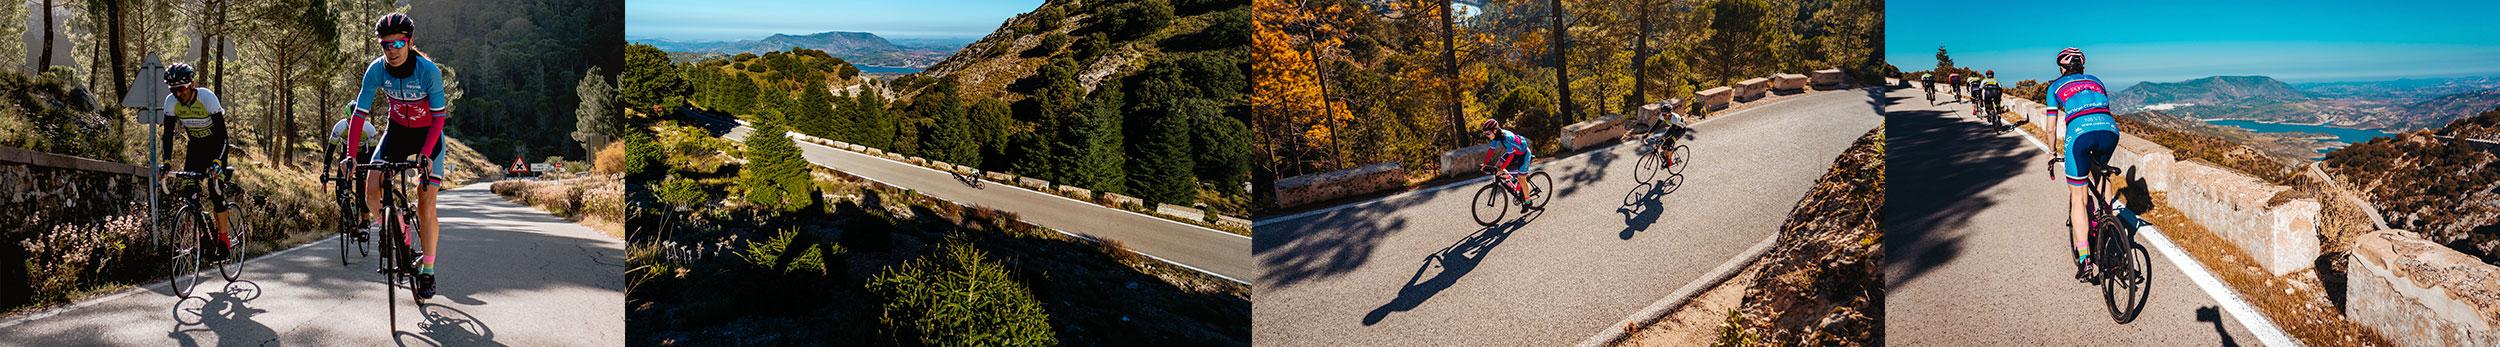 Grazalema Bike Challenge | Carlos Villarin | Diseñador Freelance